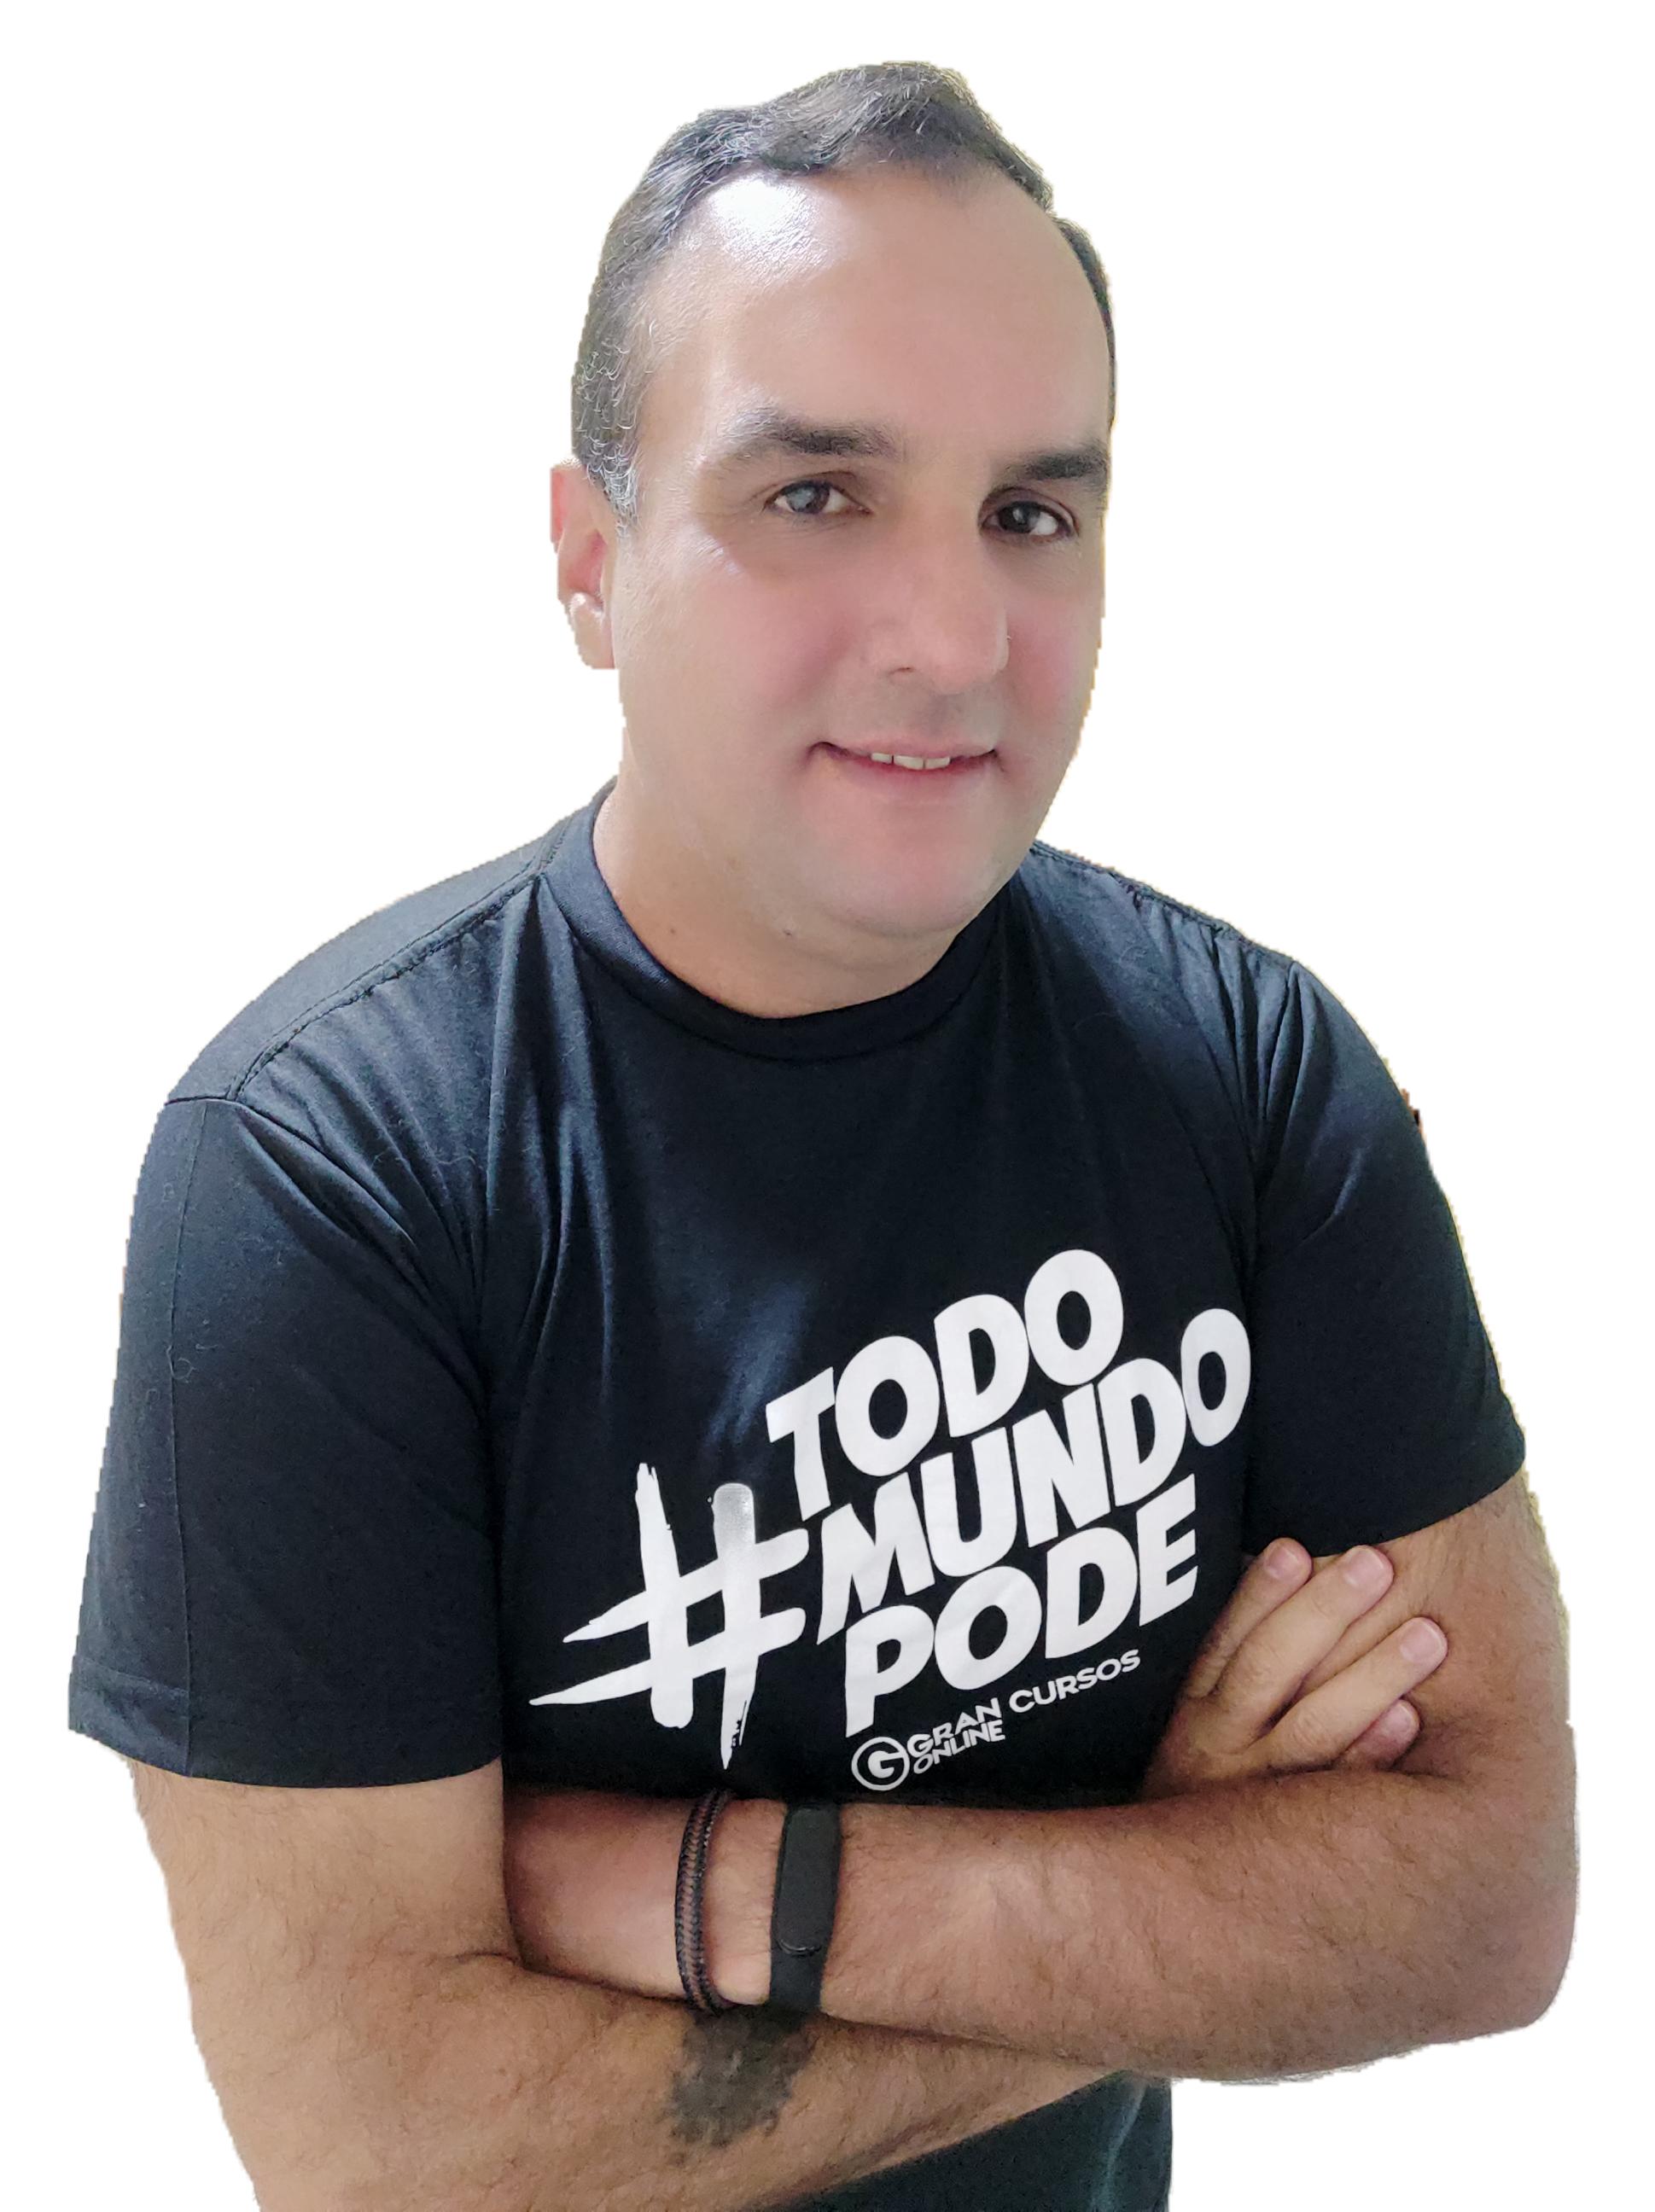 Luis Octavio Lima